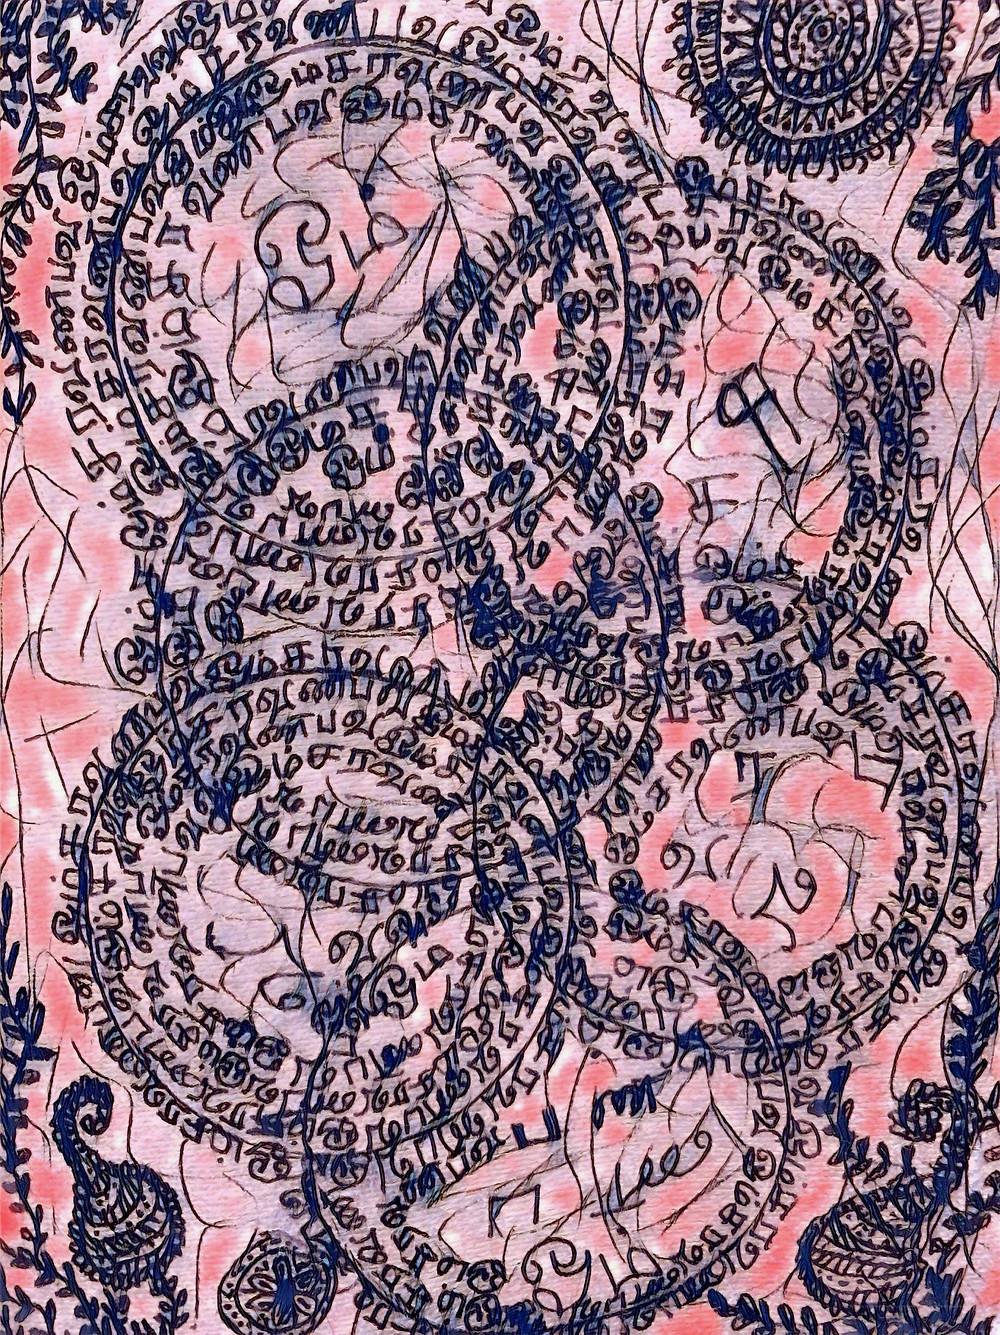 Divine Art of Neelam Sundaram   Meditate on Sakti, feminine energy, who empowers this form. Meditate on Sakti, feminine energy, who  transcends this form.  Your Guru nearby. Your Guru Beyond. Sakti, feminine energy,  empowers all forms, transcends all forms.   Aum Sundaram Aumkaar Sundaram